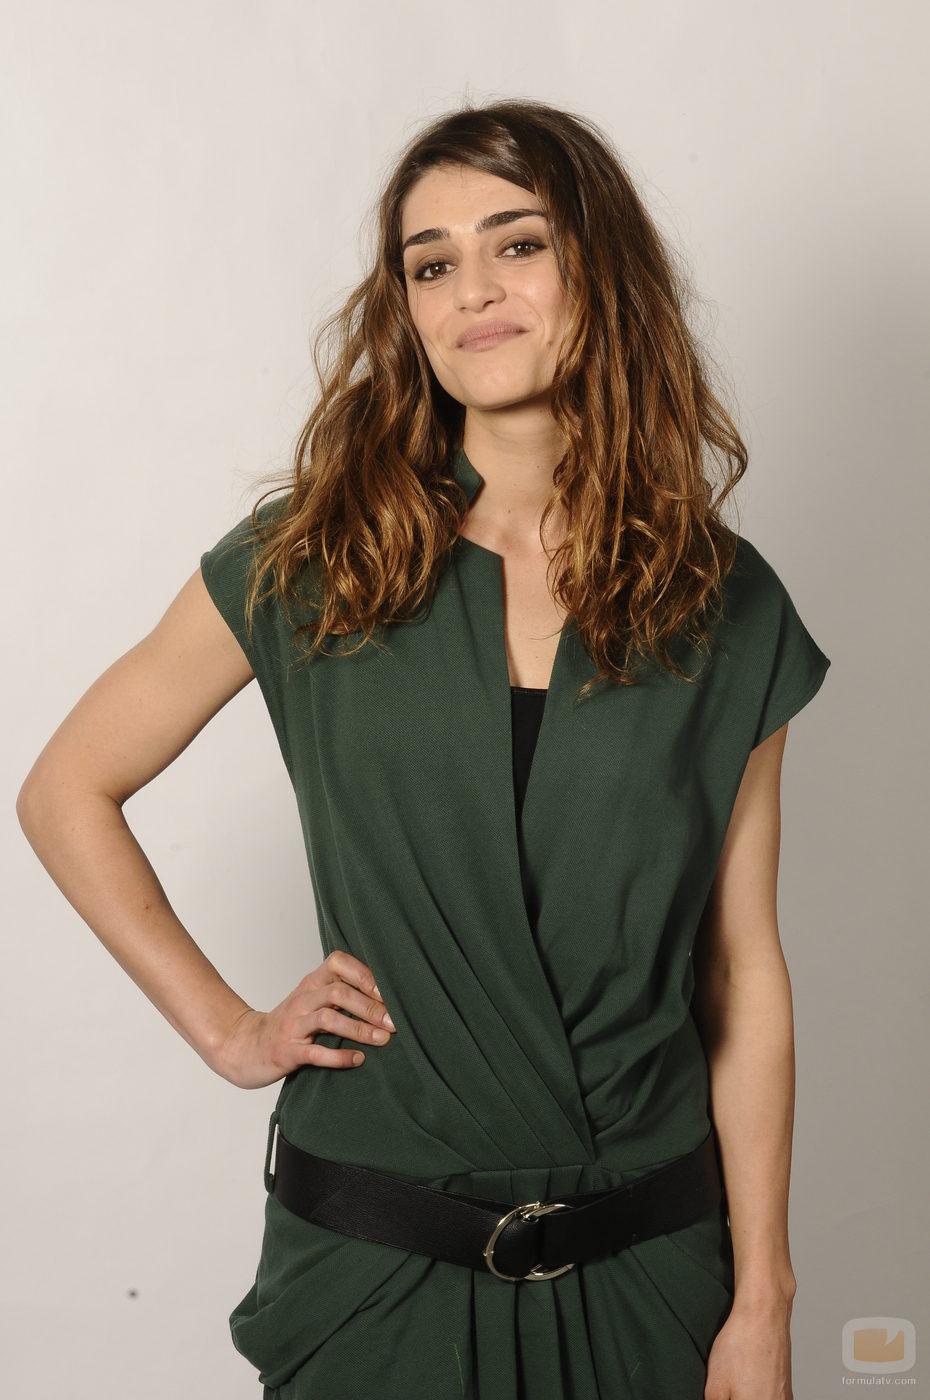 Micas Kamistad Celebrity Pictures Portal Picture